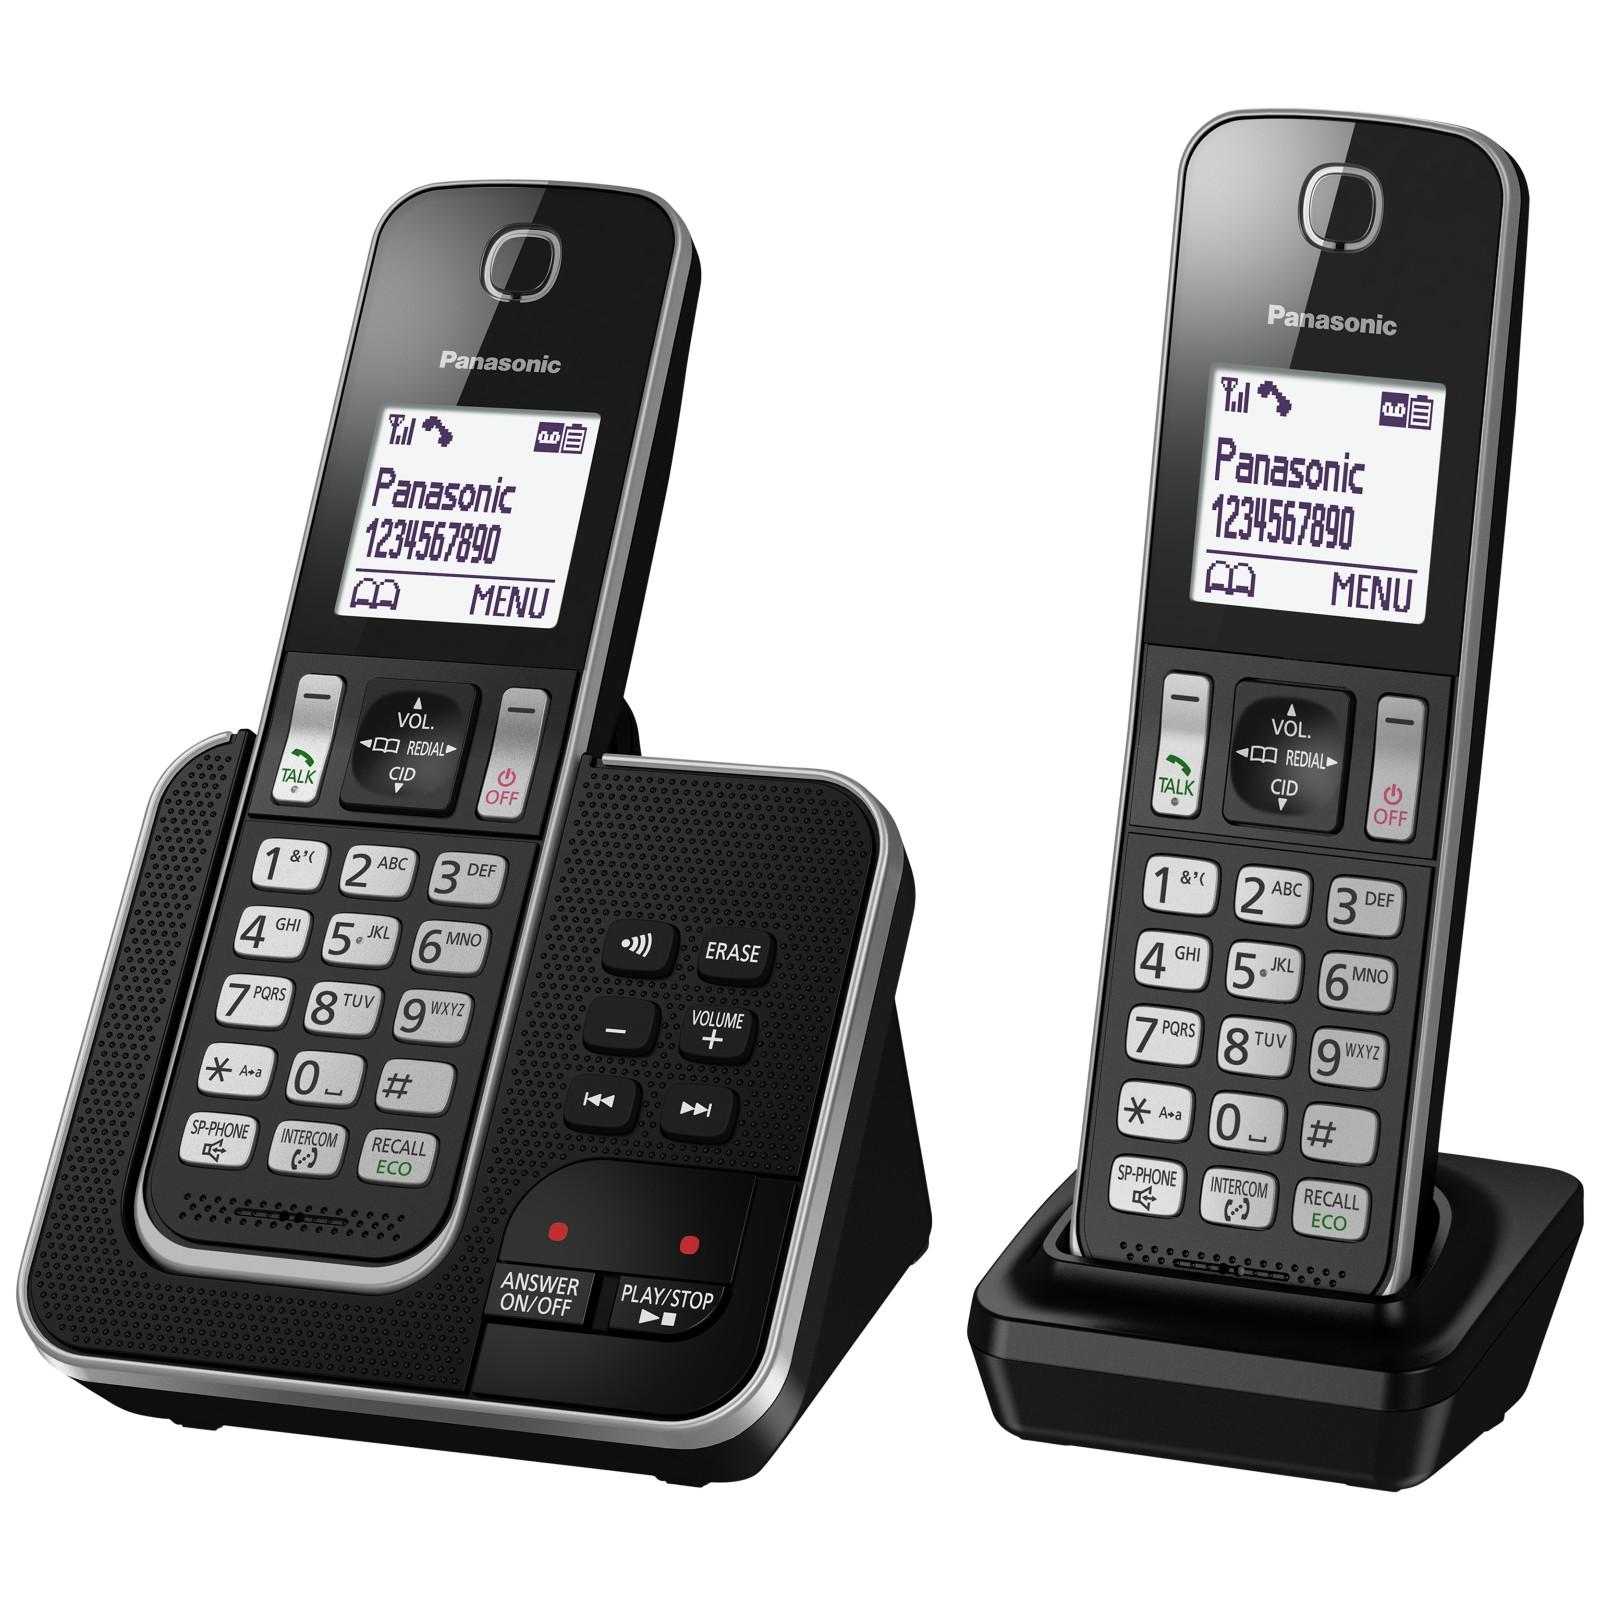 Panasonic KX-TGD322EB Digital Cordless Phone with Nuisance Call Control and Answering Machine